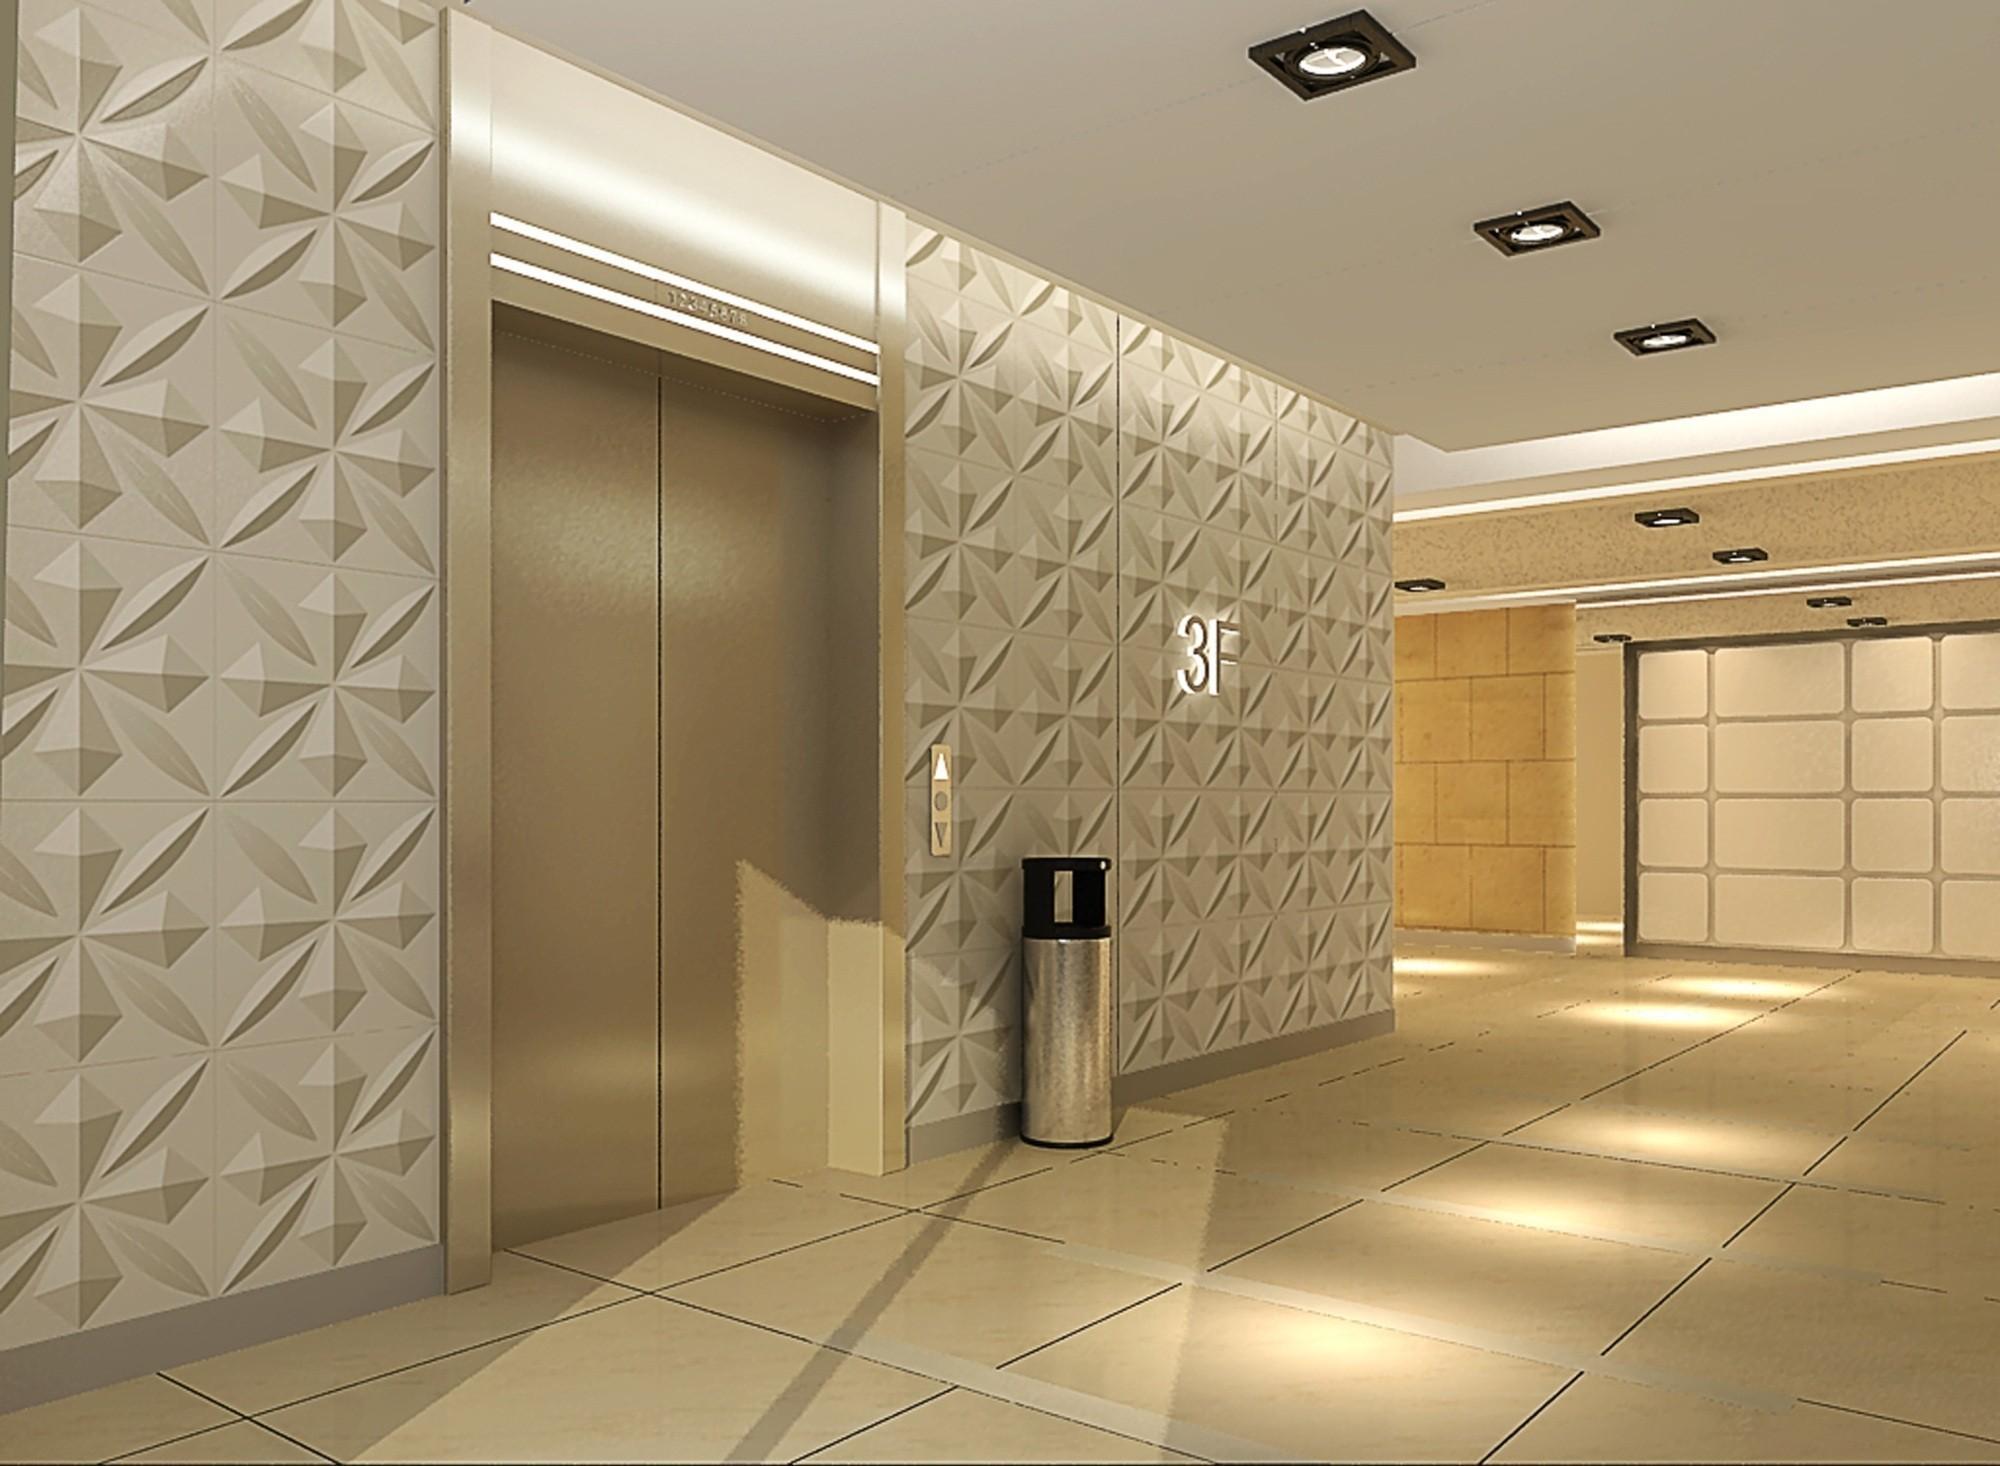 20 m2 paneele 3d deckenpaneele wandpaneele 3d wanddekoration 50x50cm sherlock sparpakete 3d. Black Bedroom Furniture Sets. Home Design Ideas